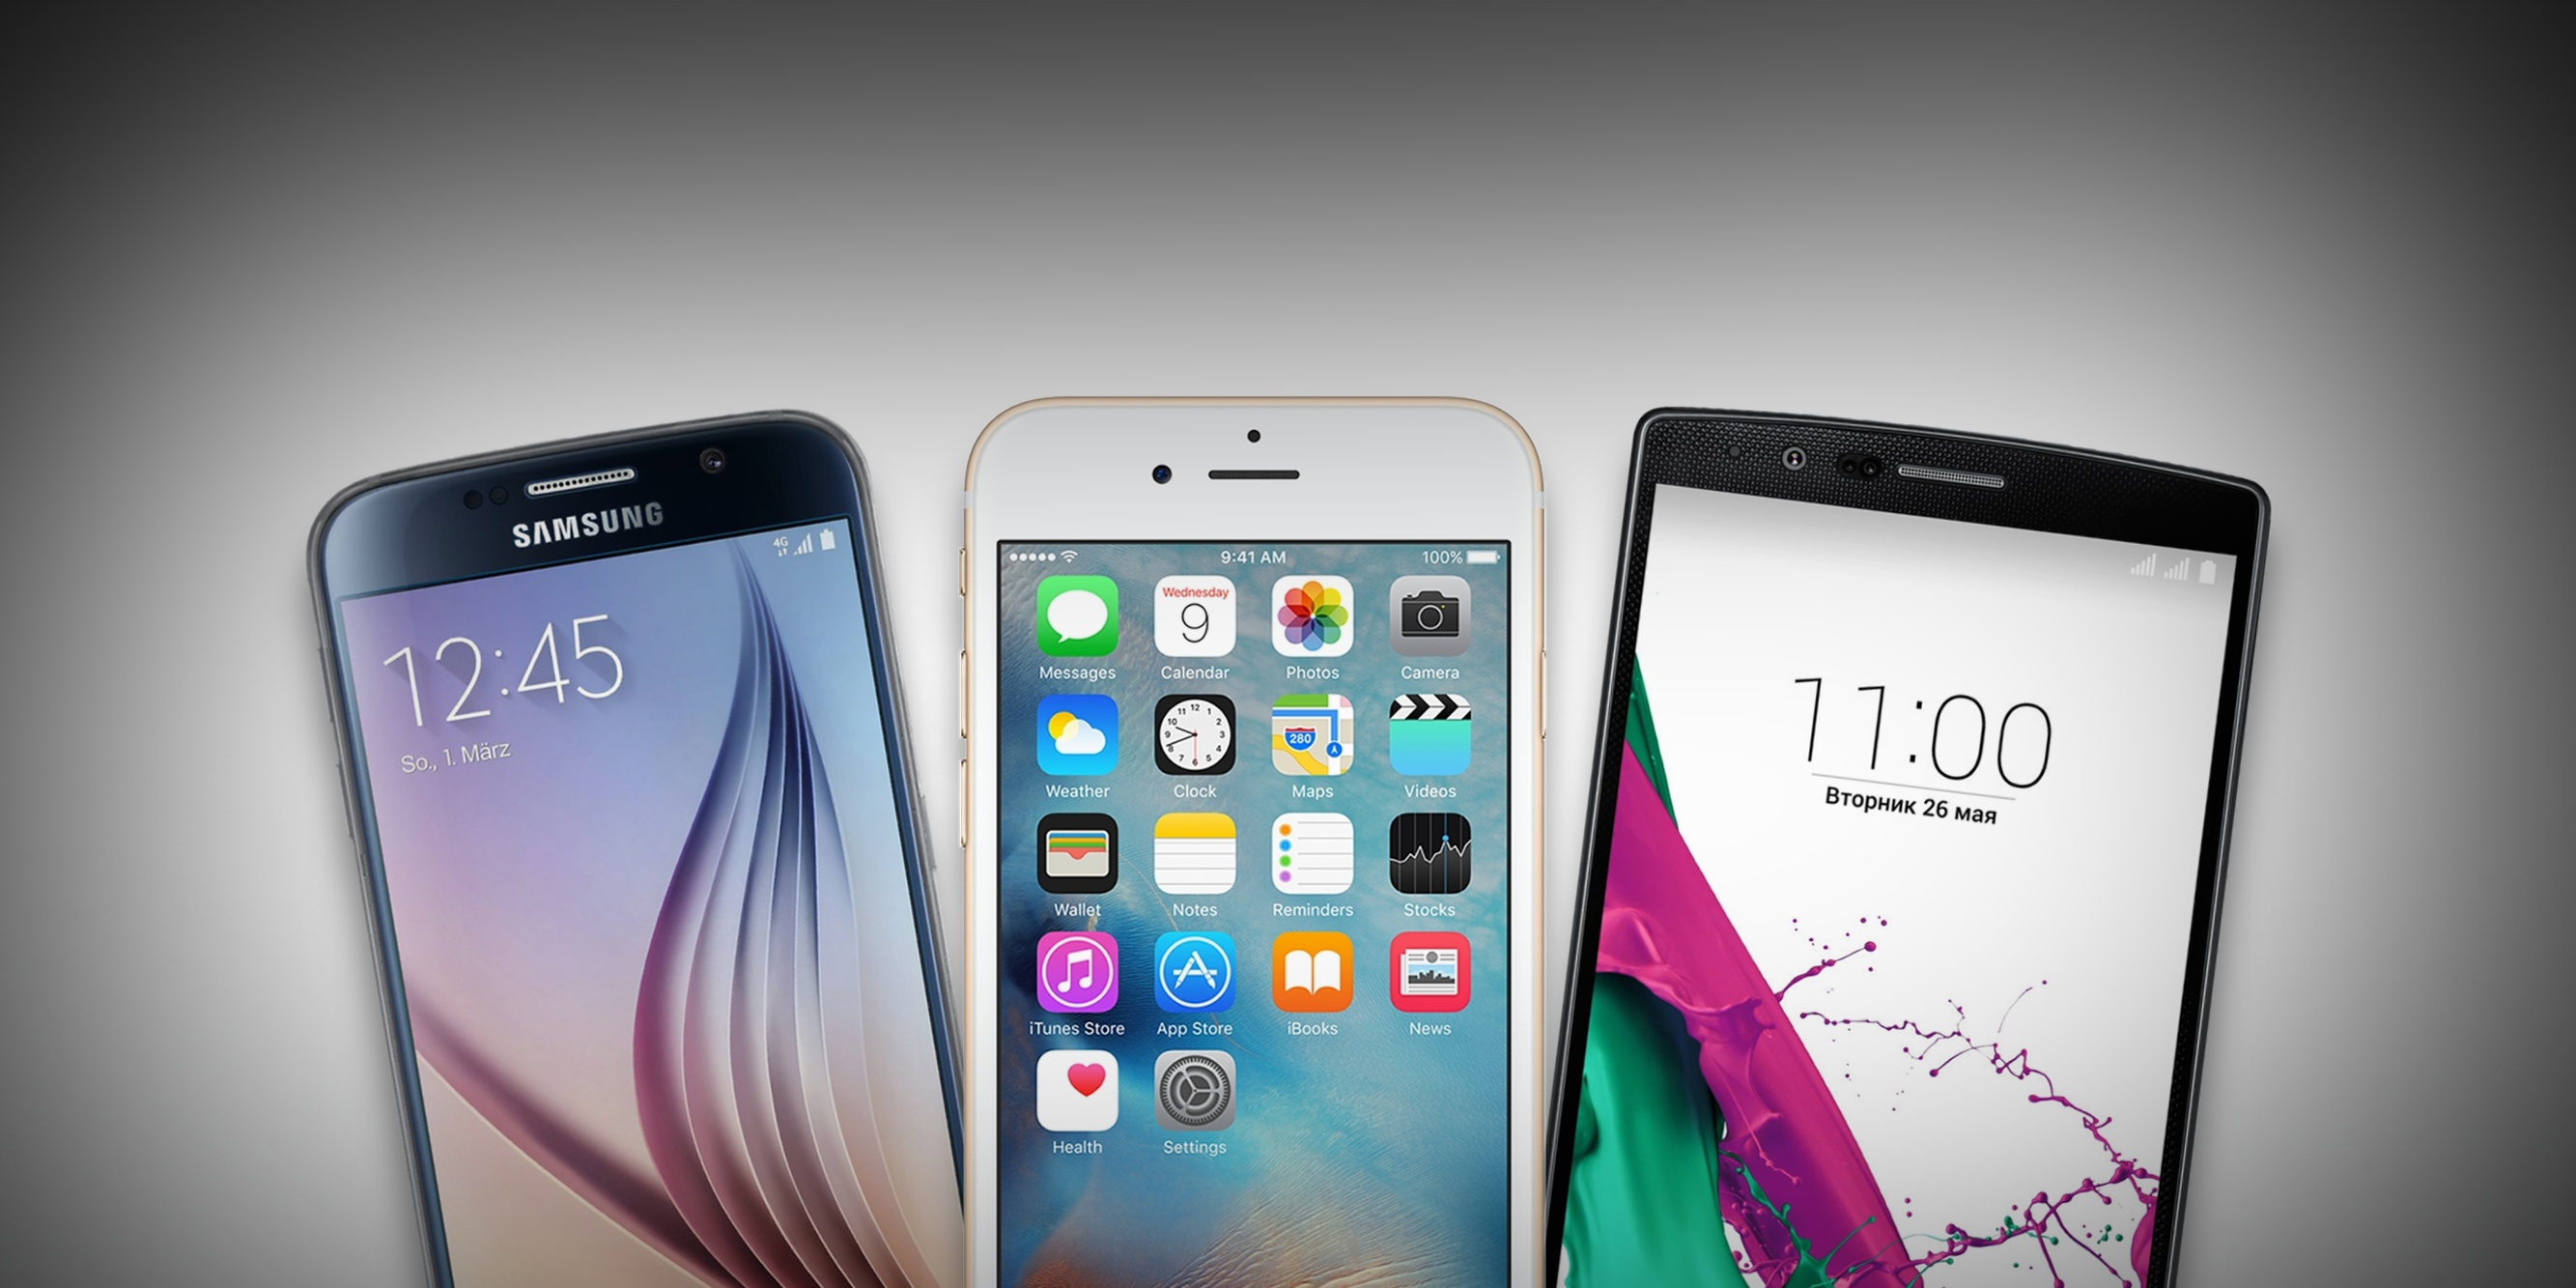 Сравнение характеристик iPhone 6s и флагманов Samsung и LG